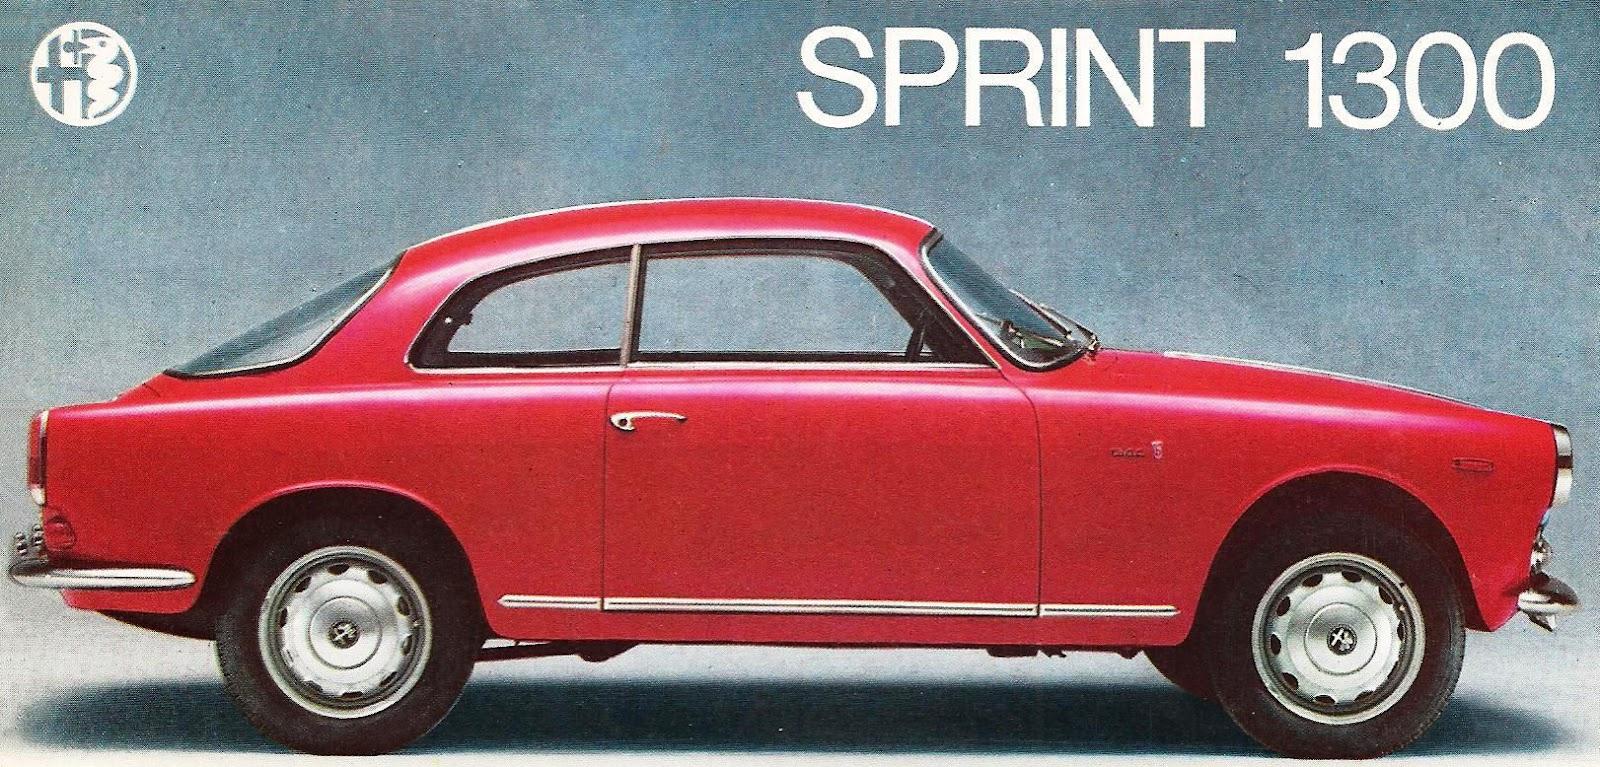 1964-Alfa-Romeo-Sprint-1300-011.jpg